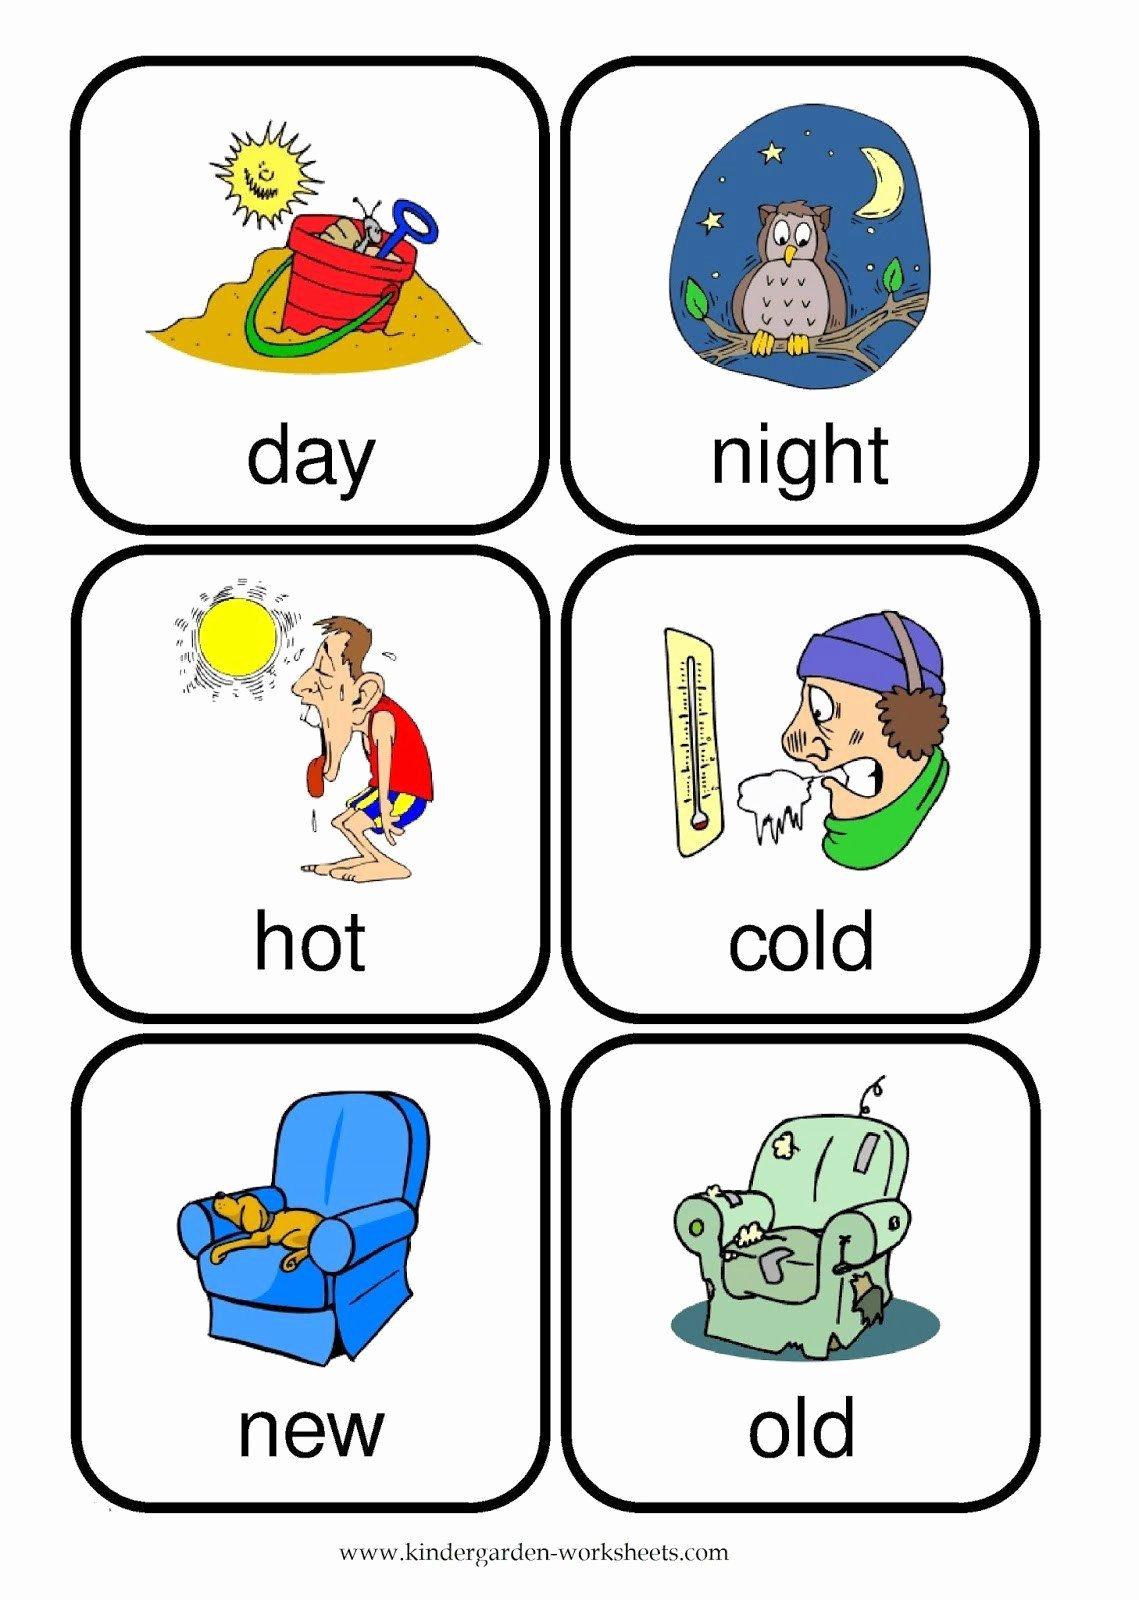 Opposite Worksheets for Preschoolers Printable Opposites Worksheet for Kindergarten Opposite Words